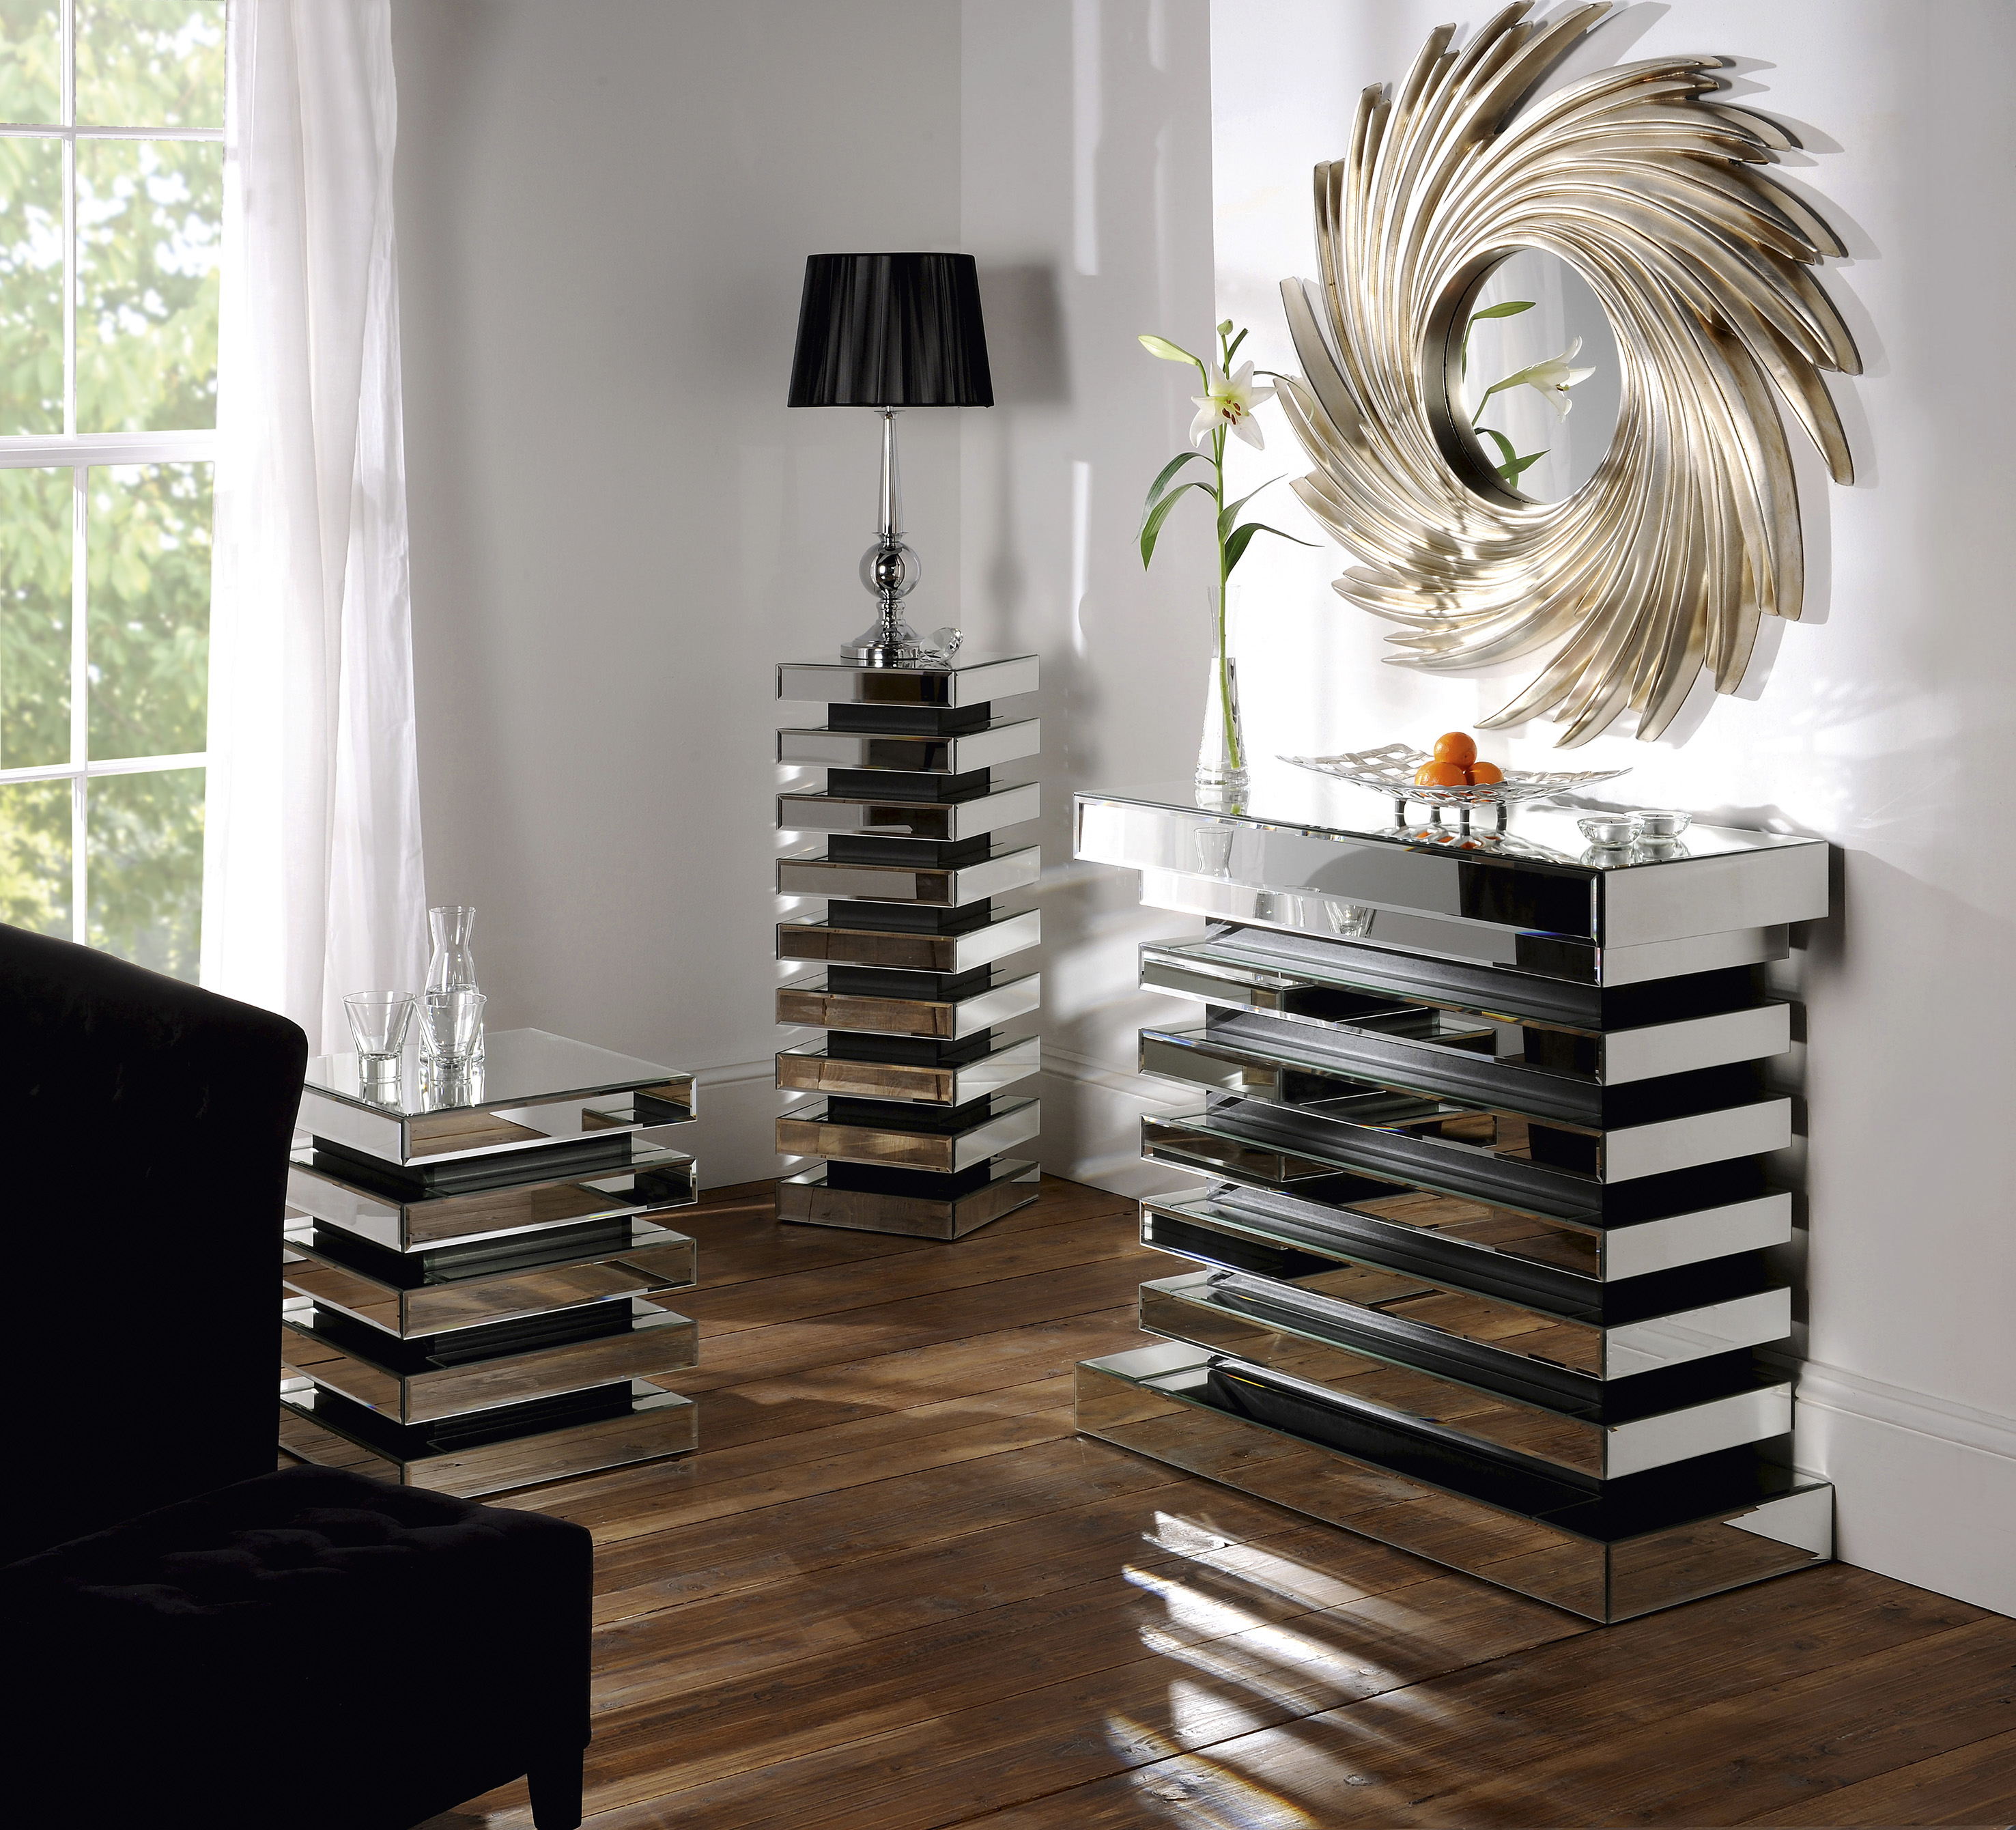 Mf15 Stand British Made Mirrors Occasional Furniture